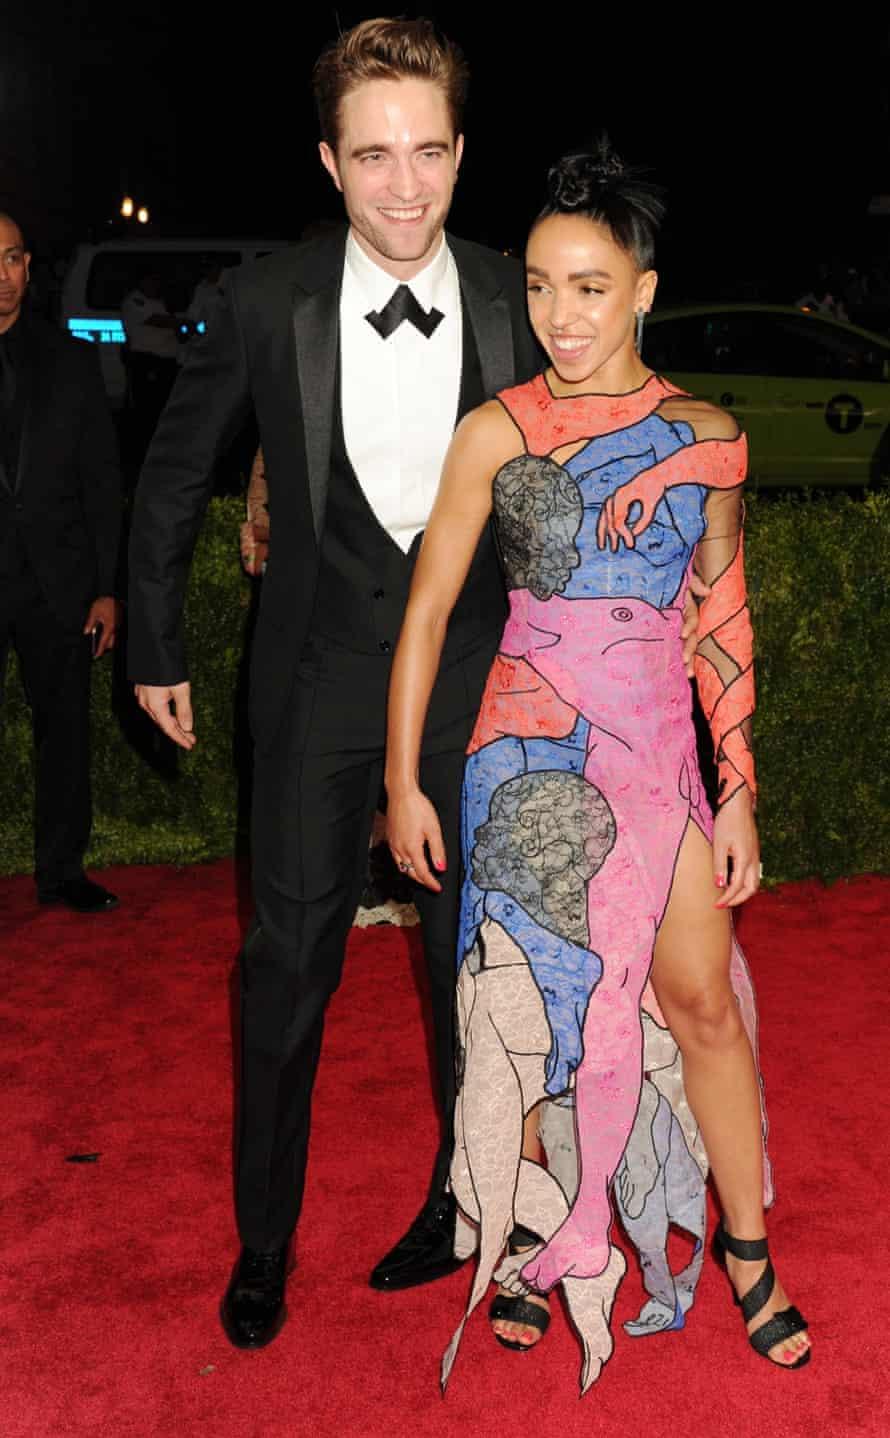 Leading lady: with girlfriend FKA Twigs.